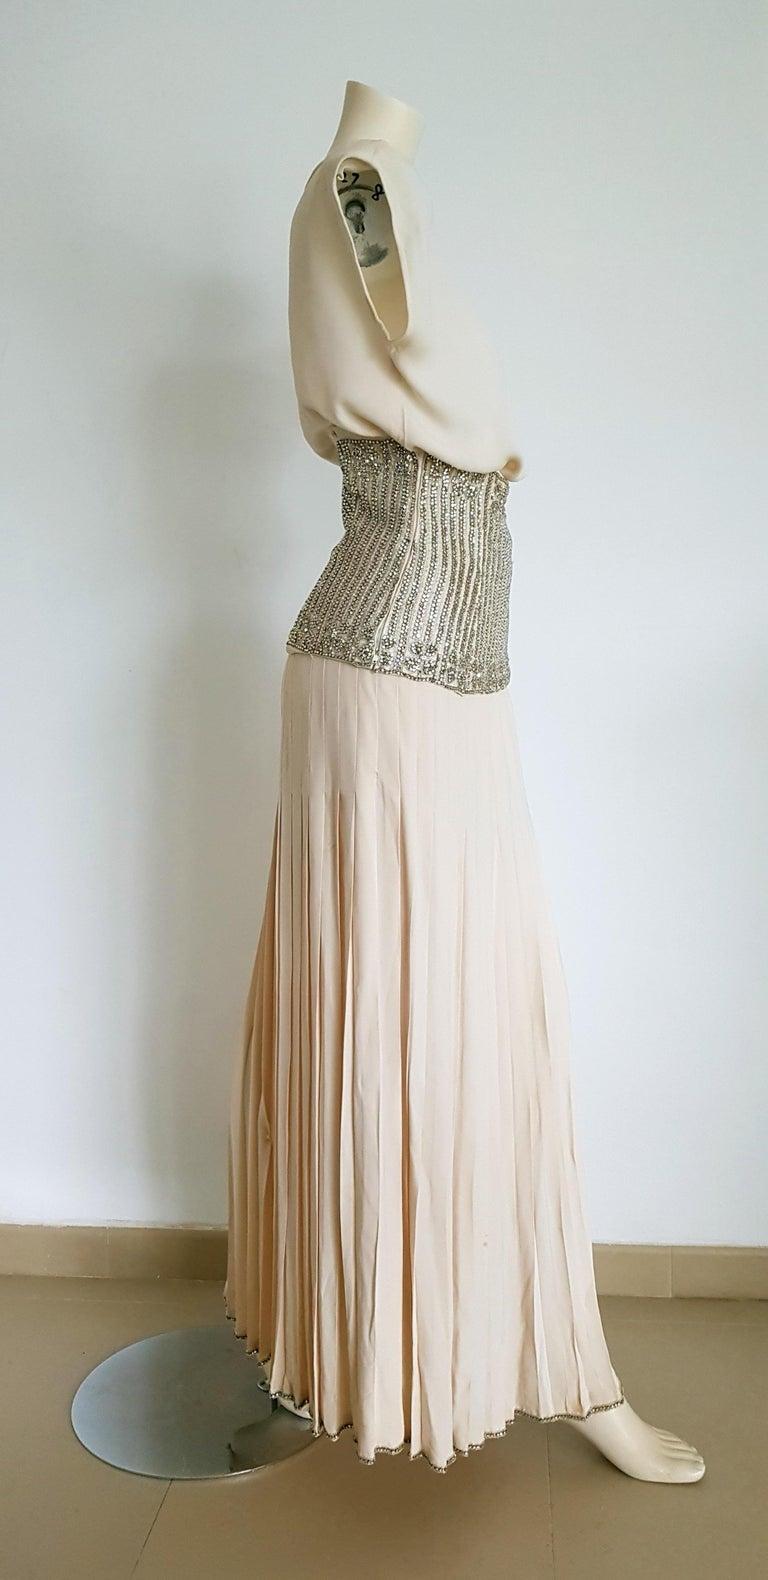 Women's VALENTINO Haute Couture Top Skirt Swarovski Diamonds Waistband Silk Dress-Unworn For Sale